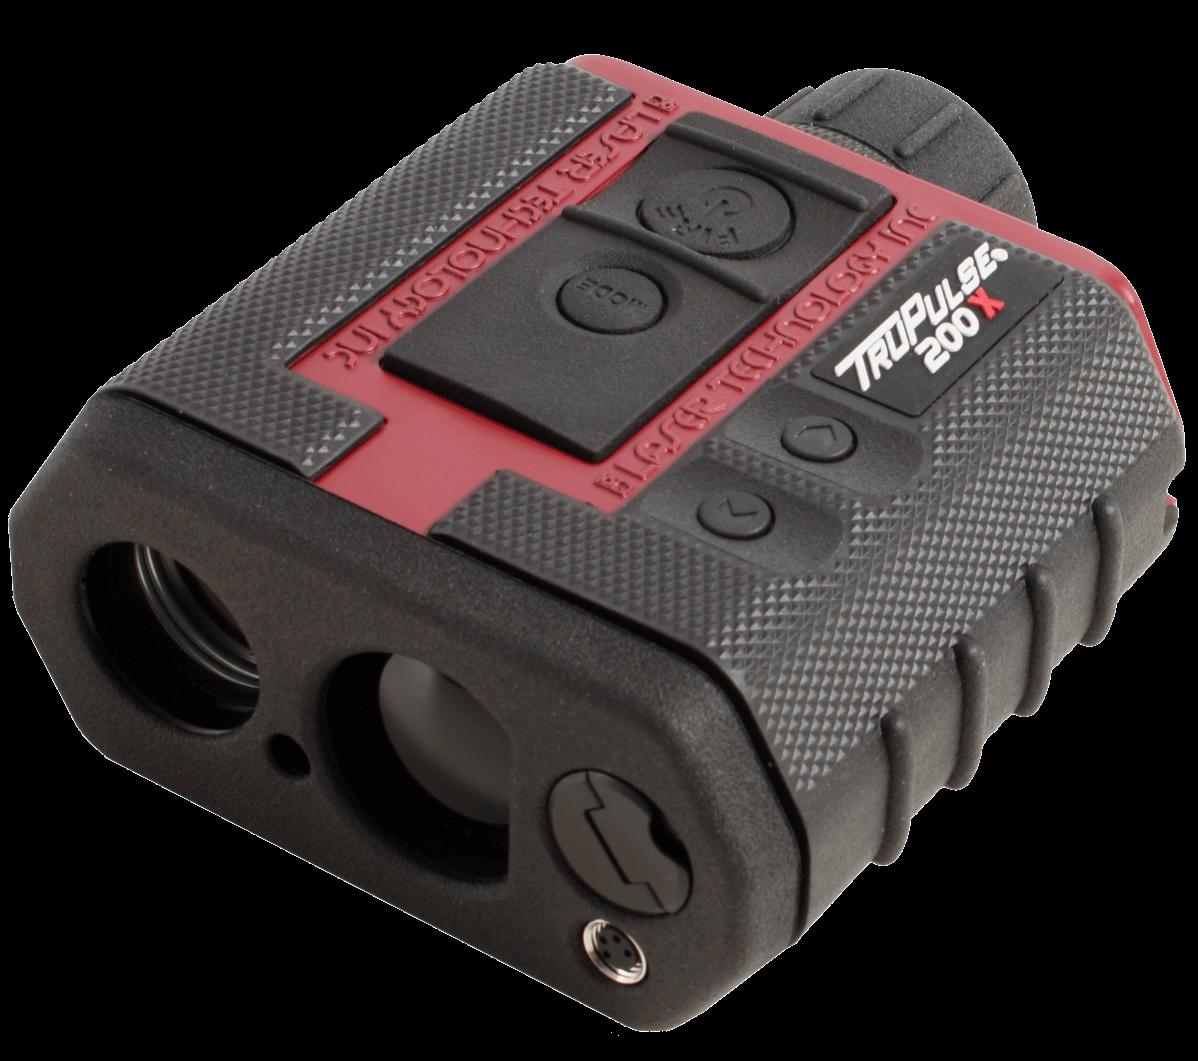 LTI laser Tech TruPulse 200X Laser Rangefinder for Laser GIS, laser offsets, laser mapping with Arrow GNSS, ArcGIS, Esri